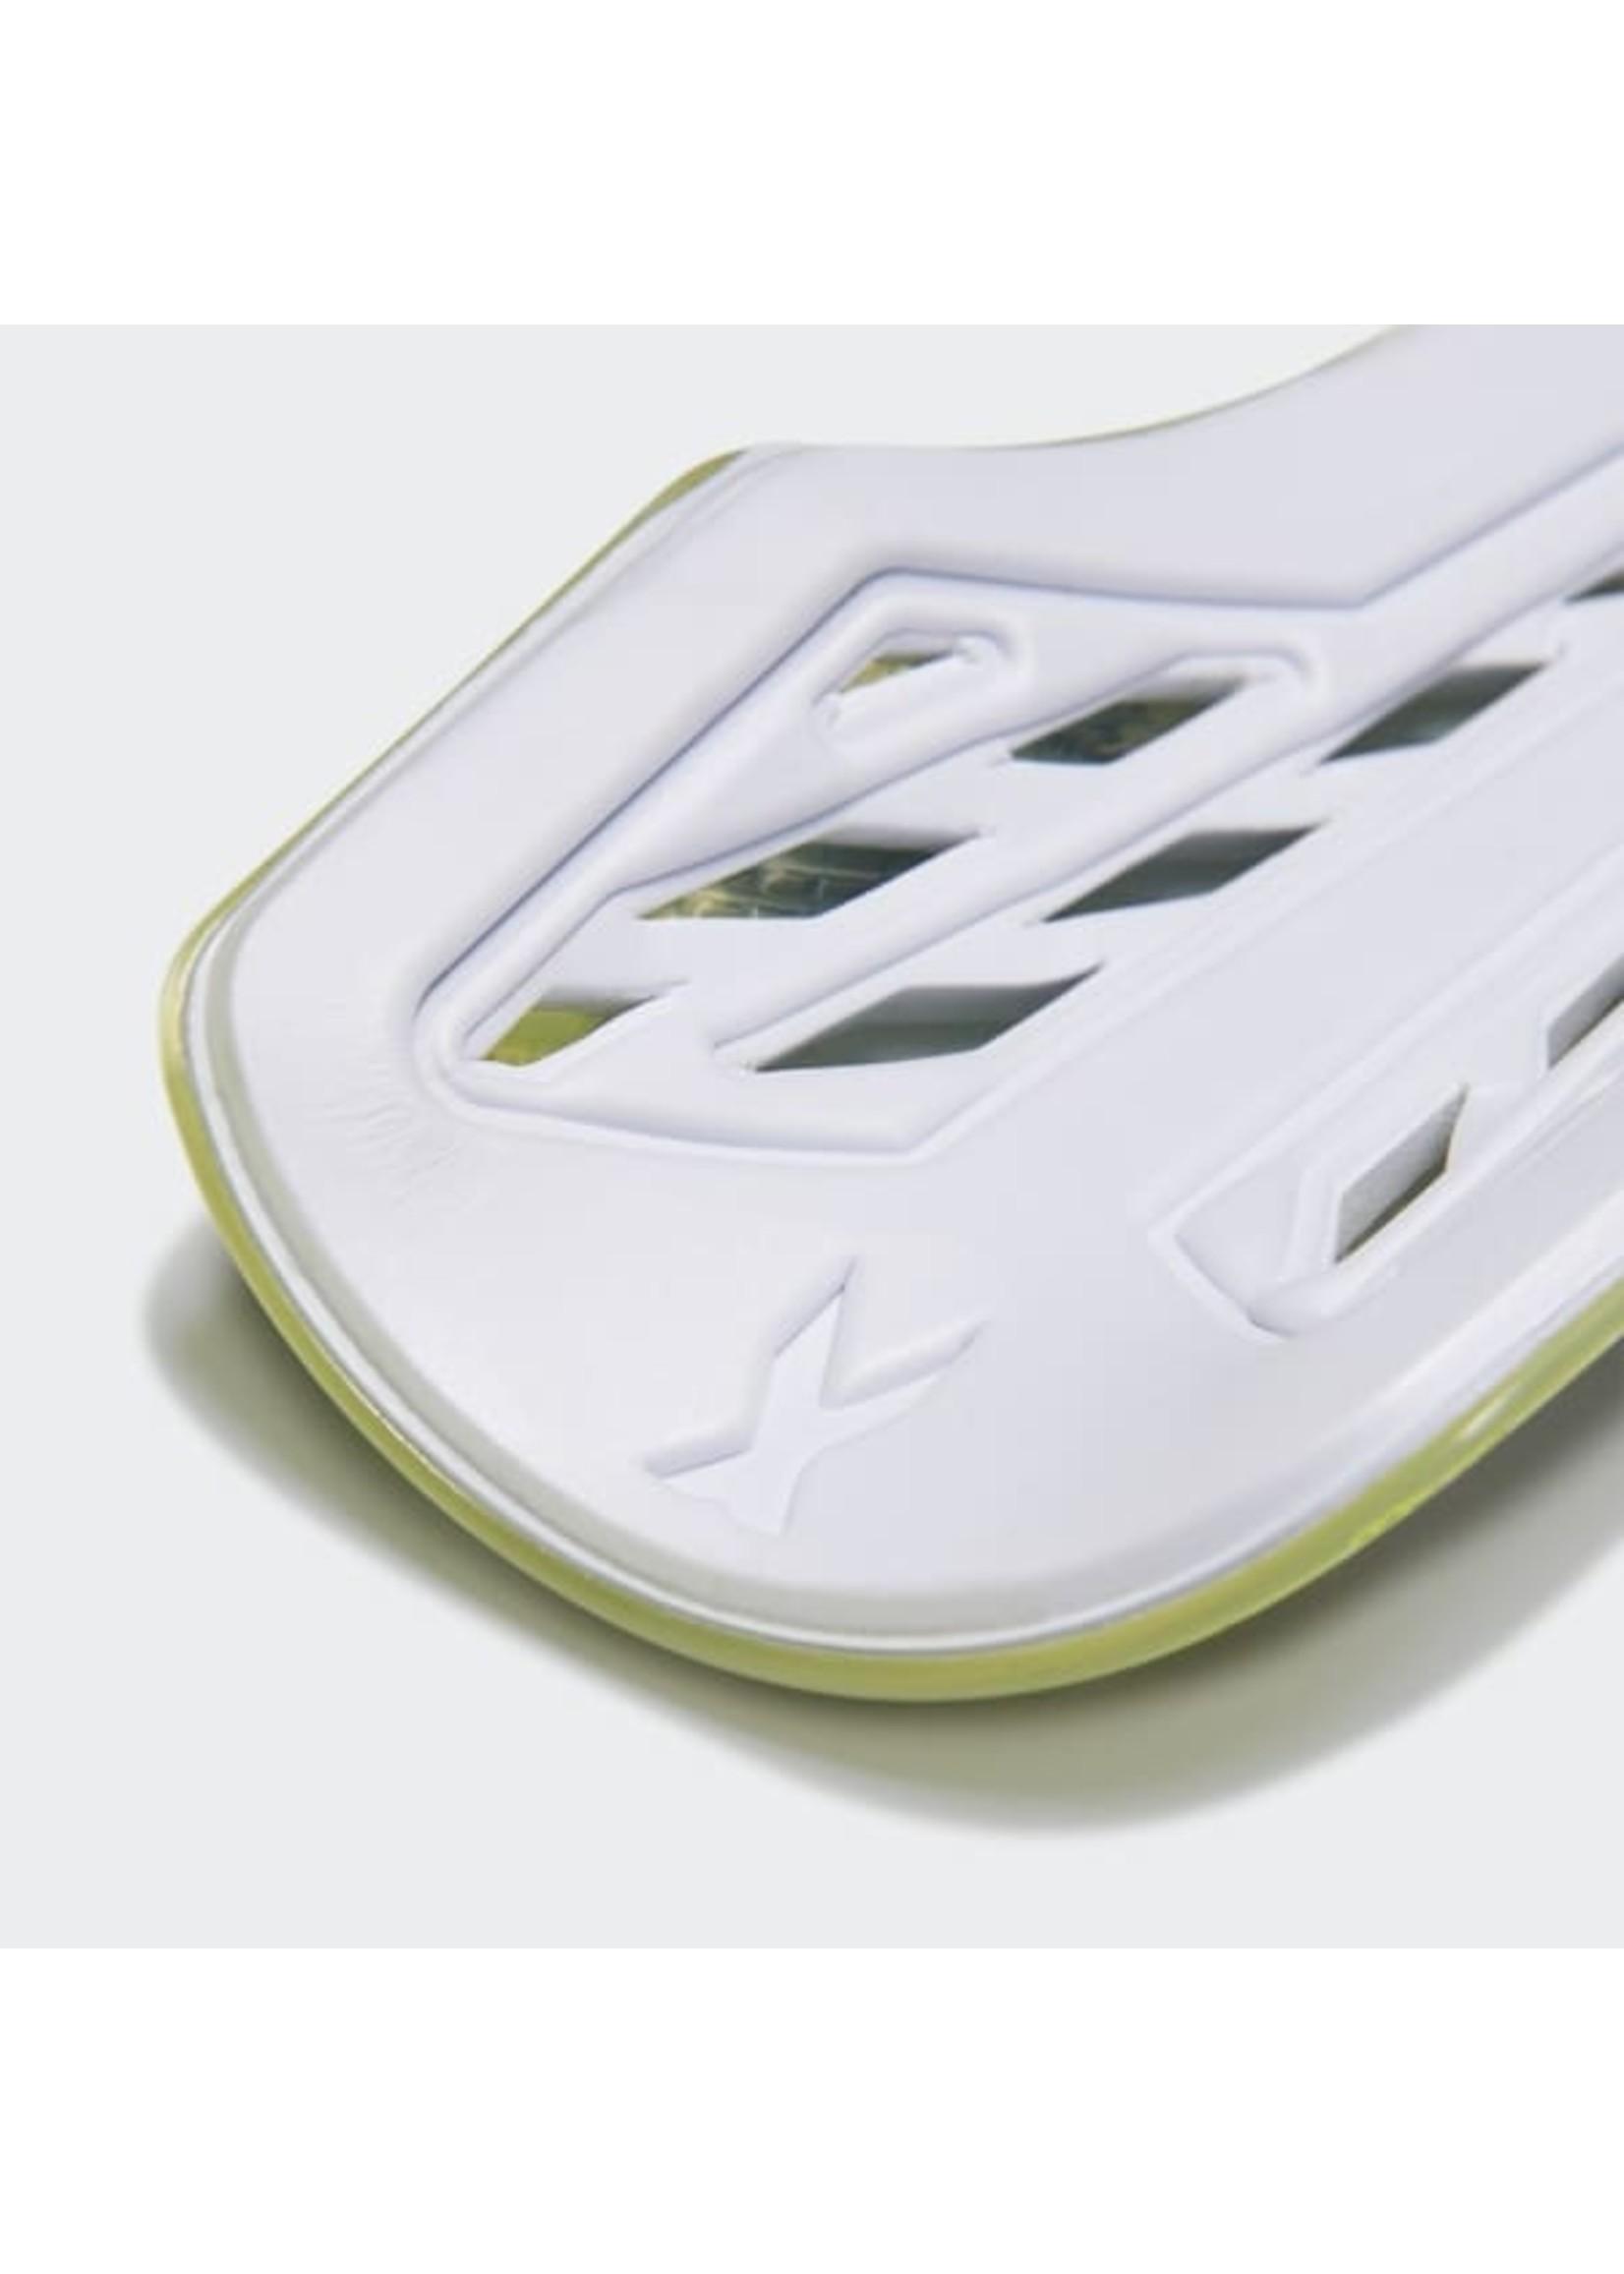 Adidas X SG LGE